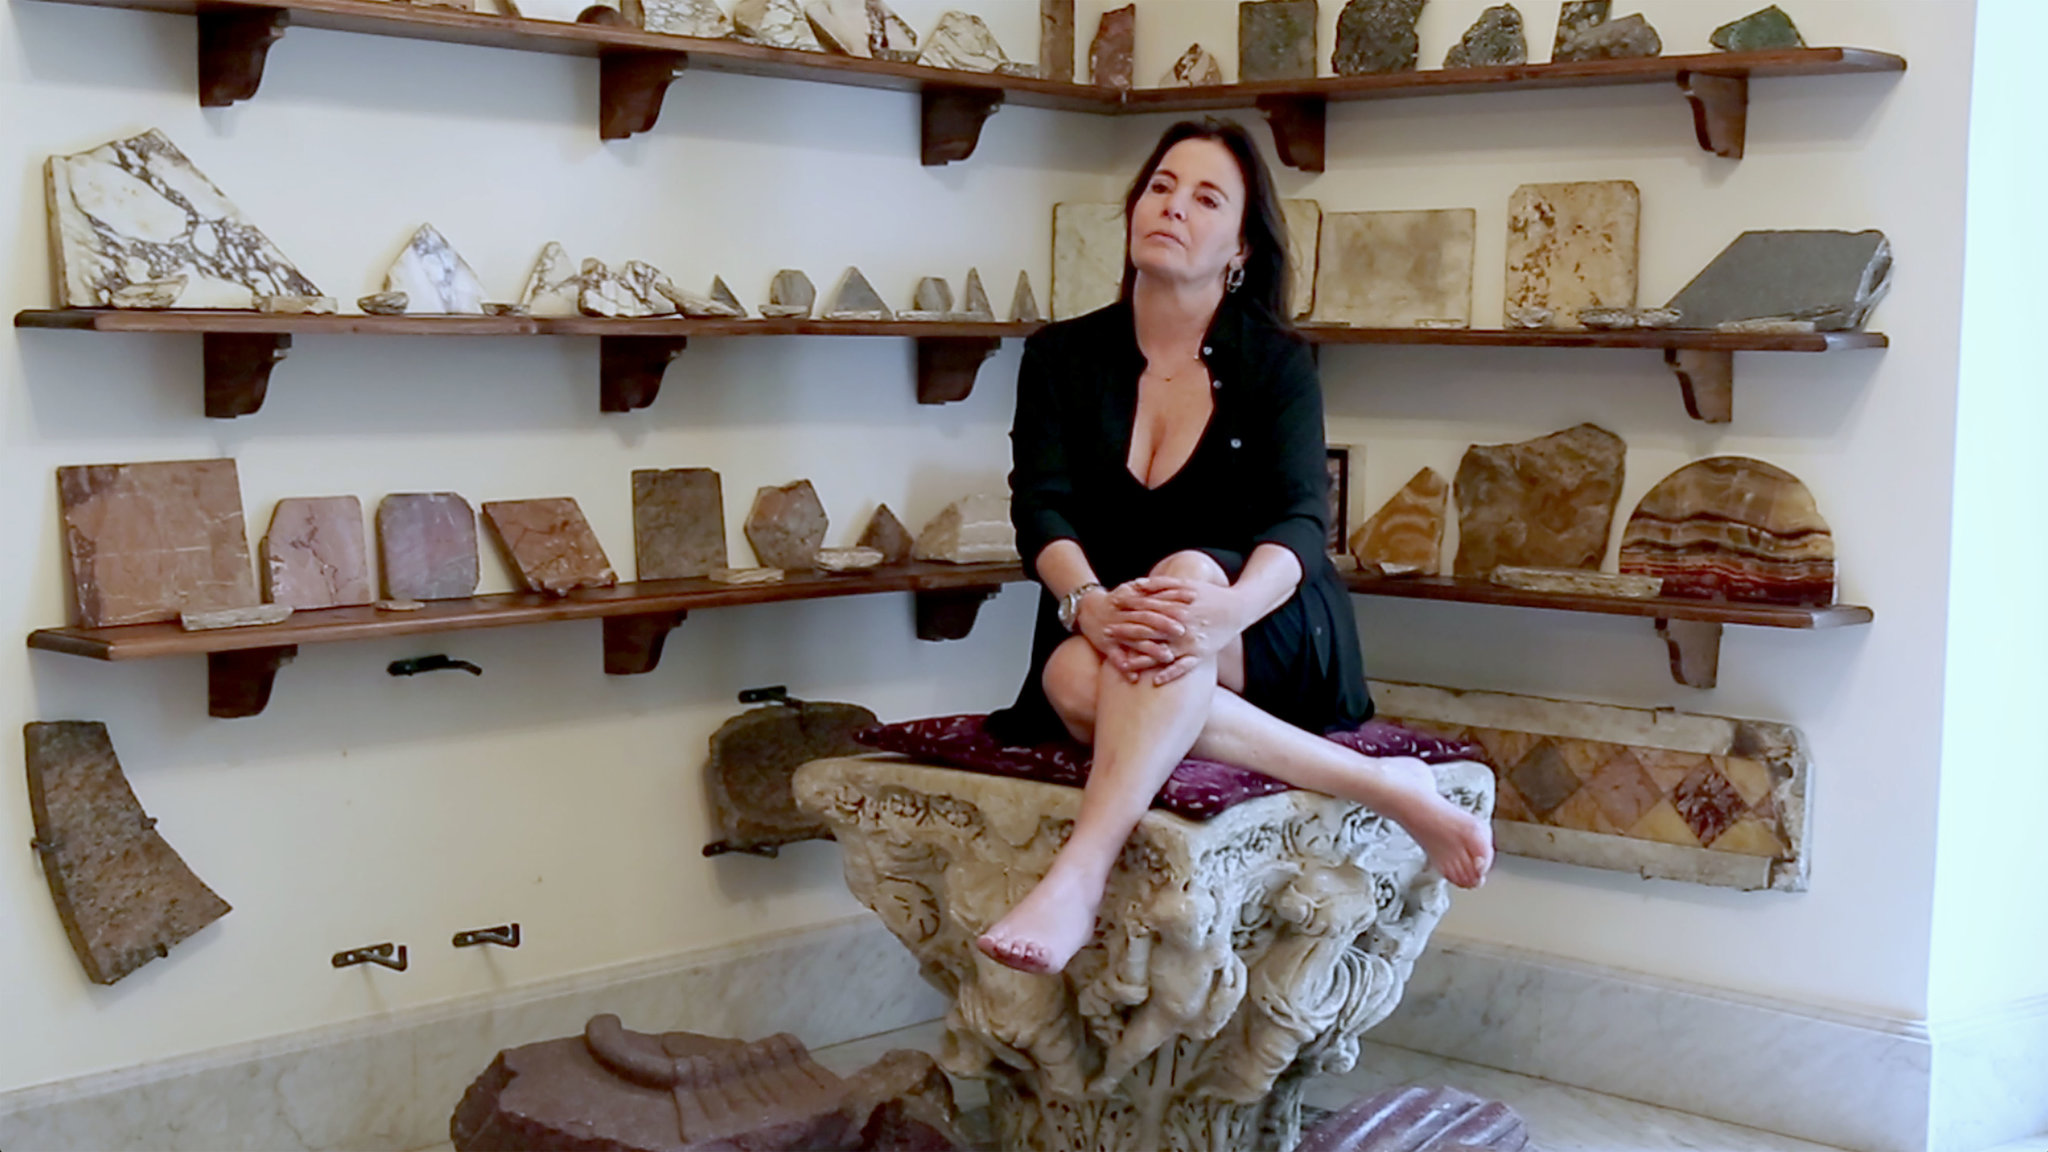 Paola Santerelli en su casa de romana para la T magazine del New York Times